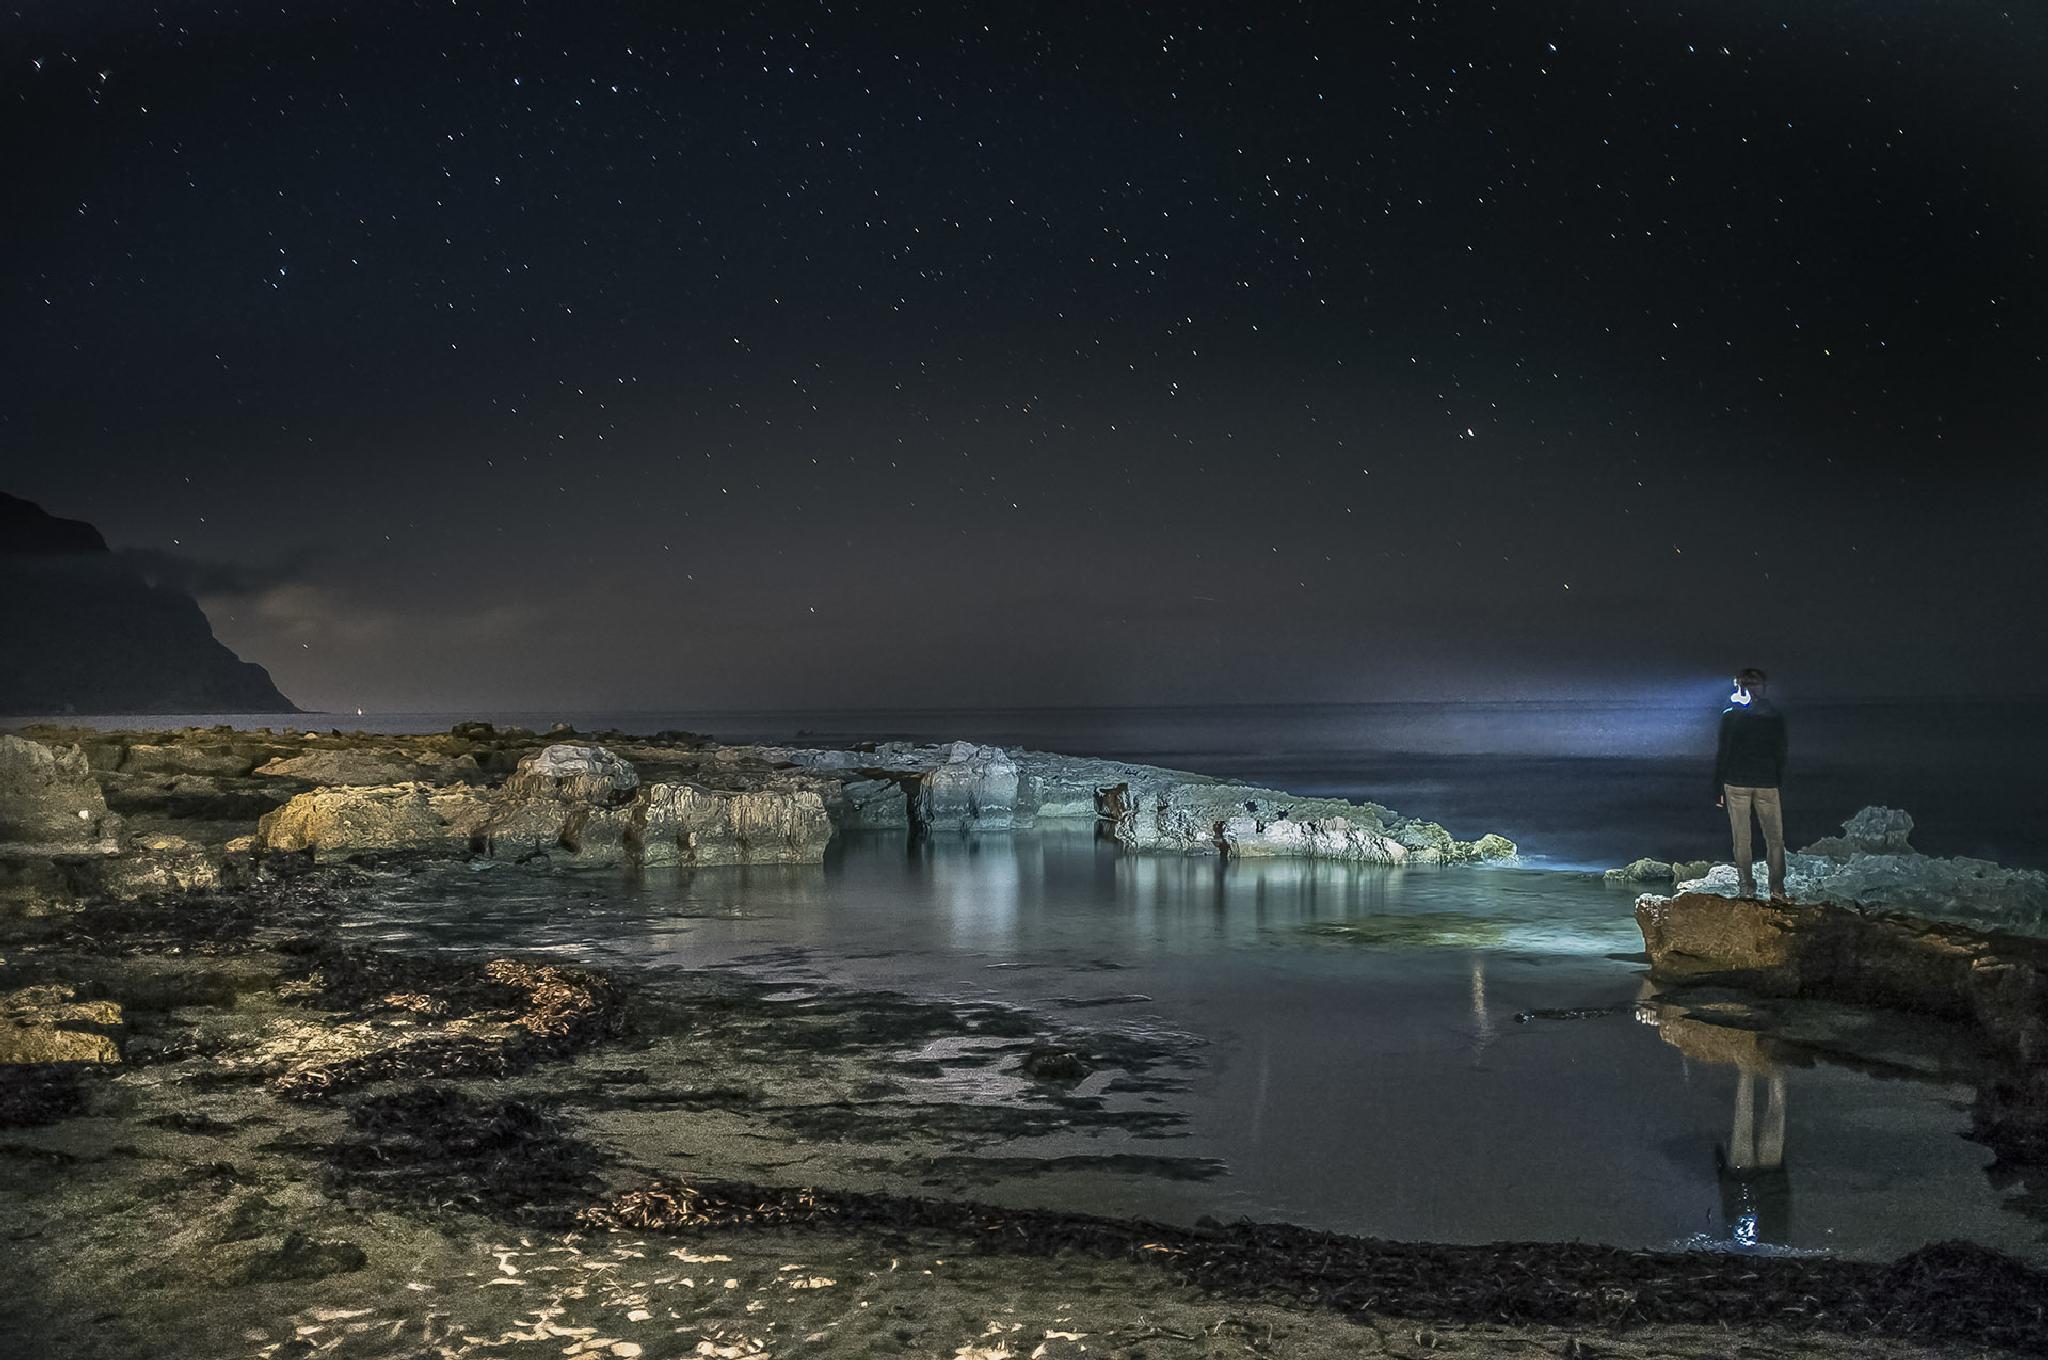 Stars in the night, Macari, october by Giuseppe Fallica